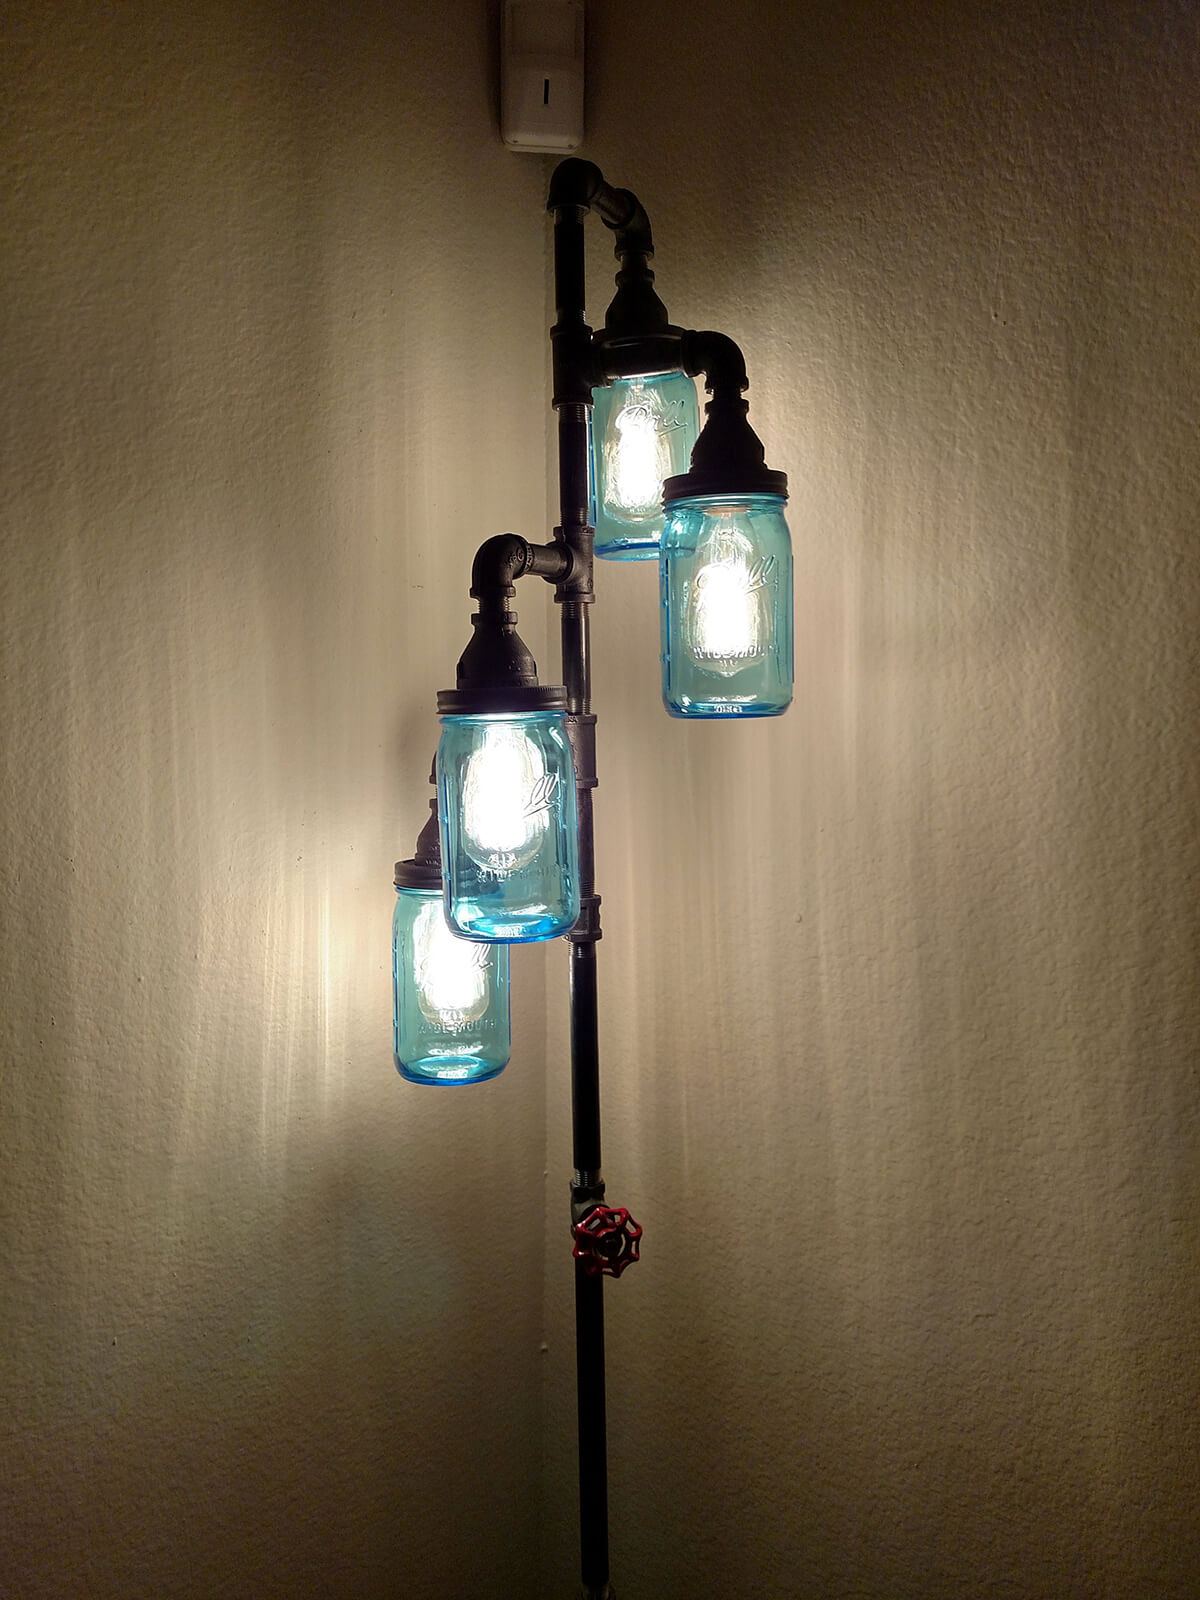 Mason Jar Lampshades on Metal Lamp